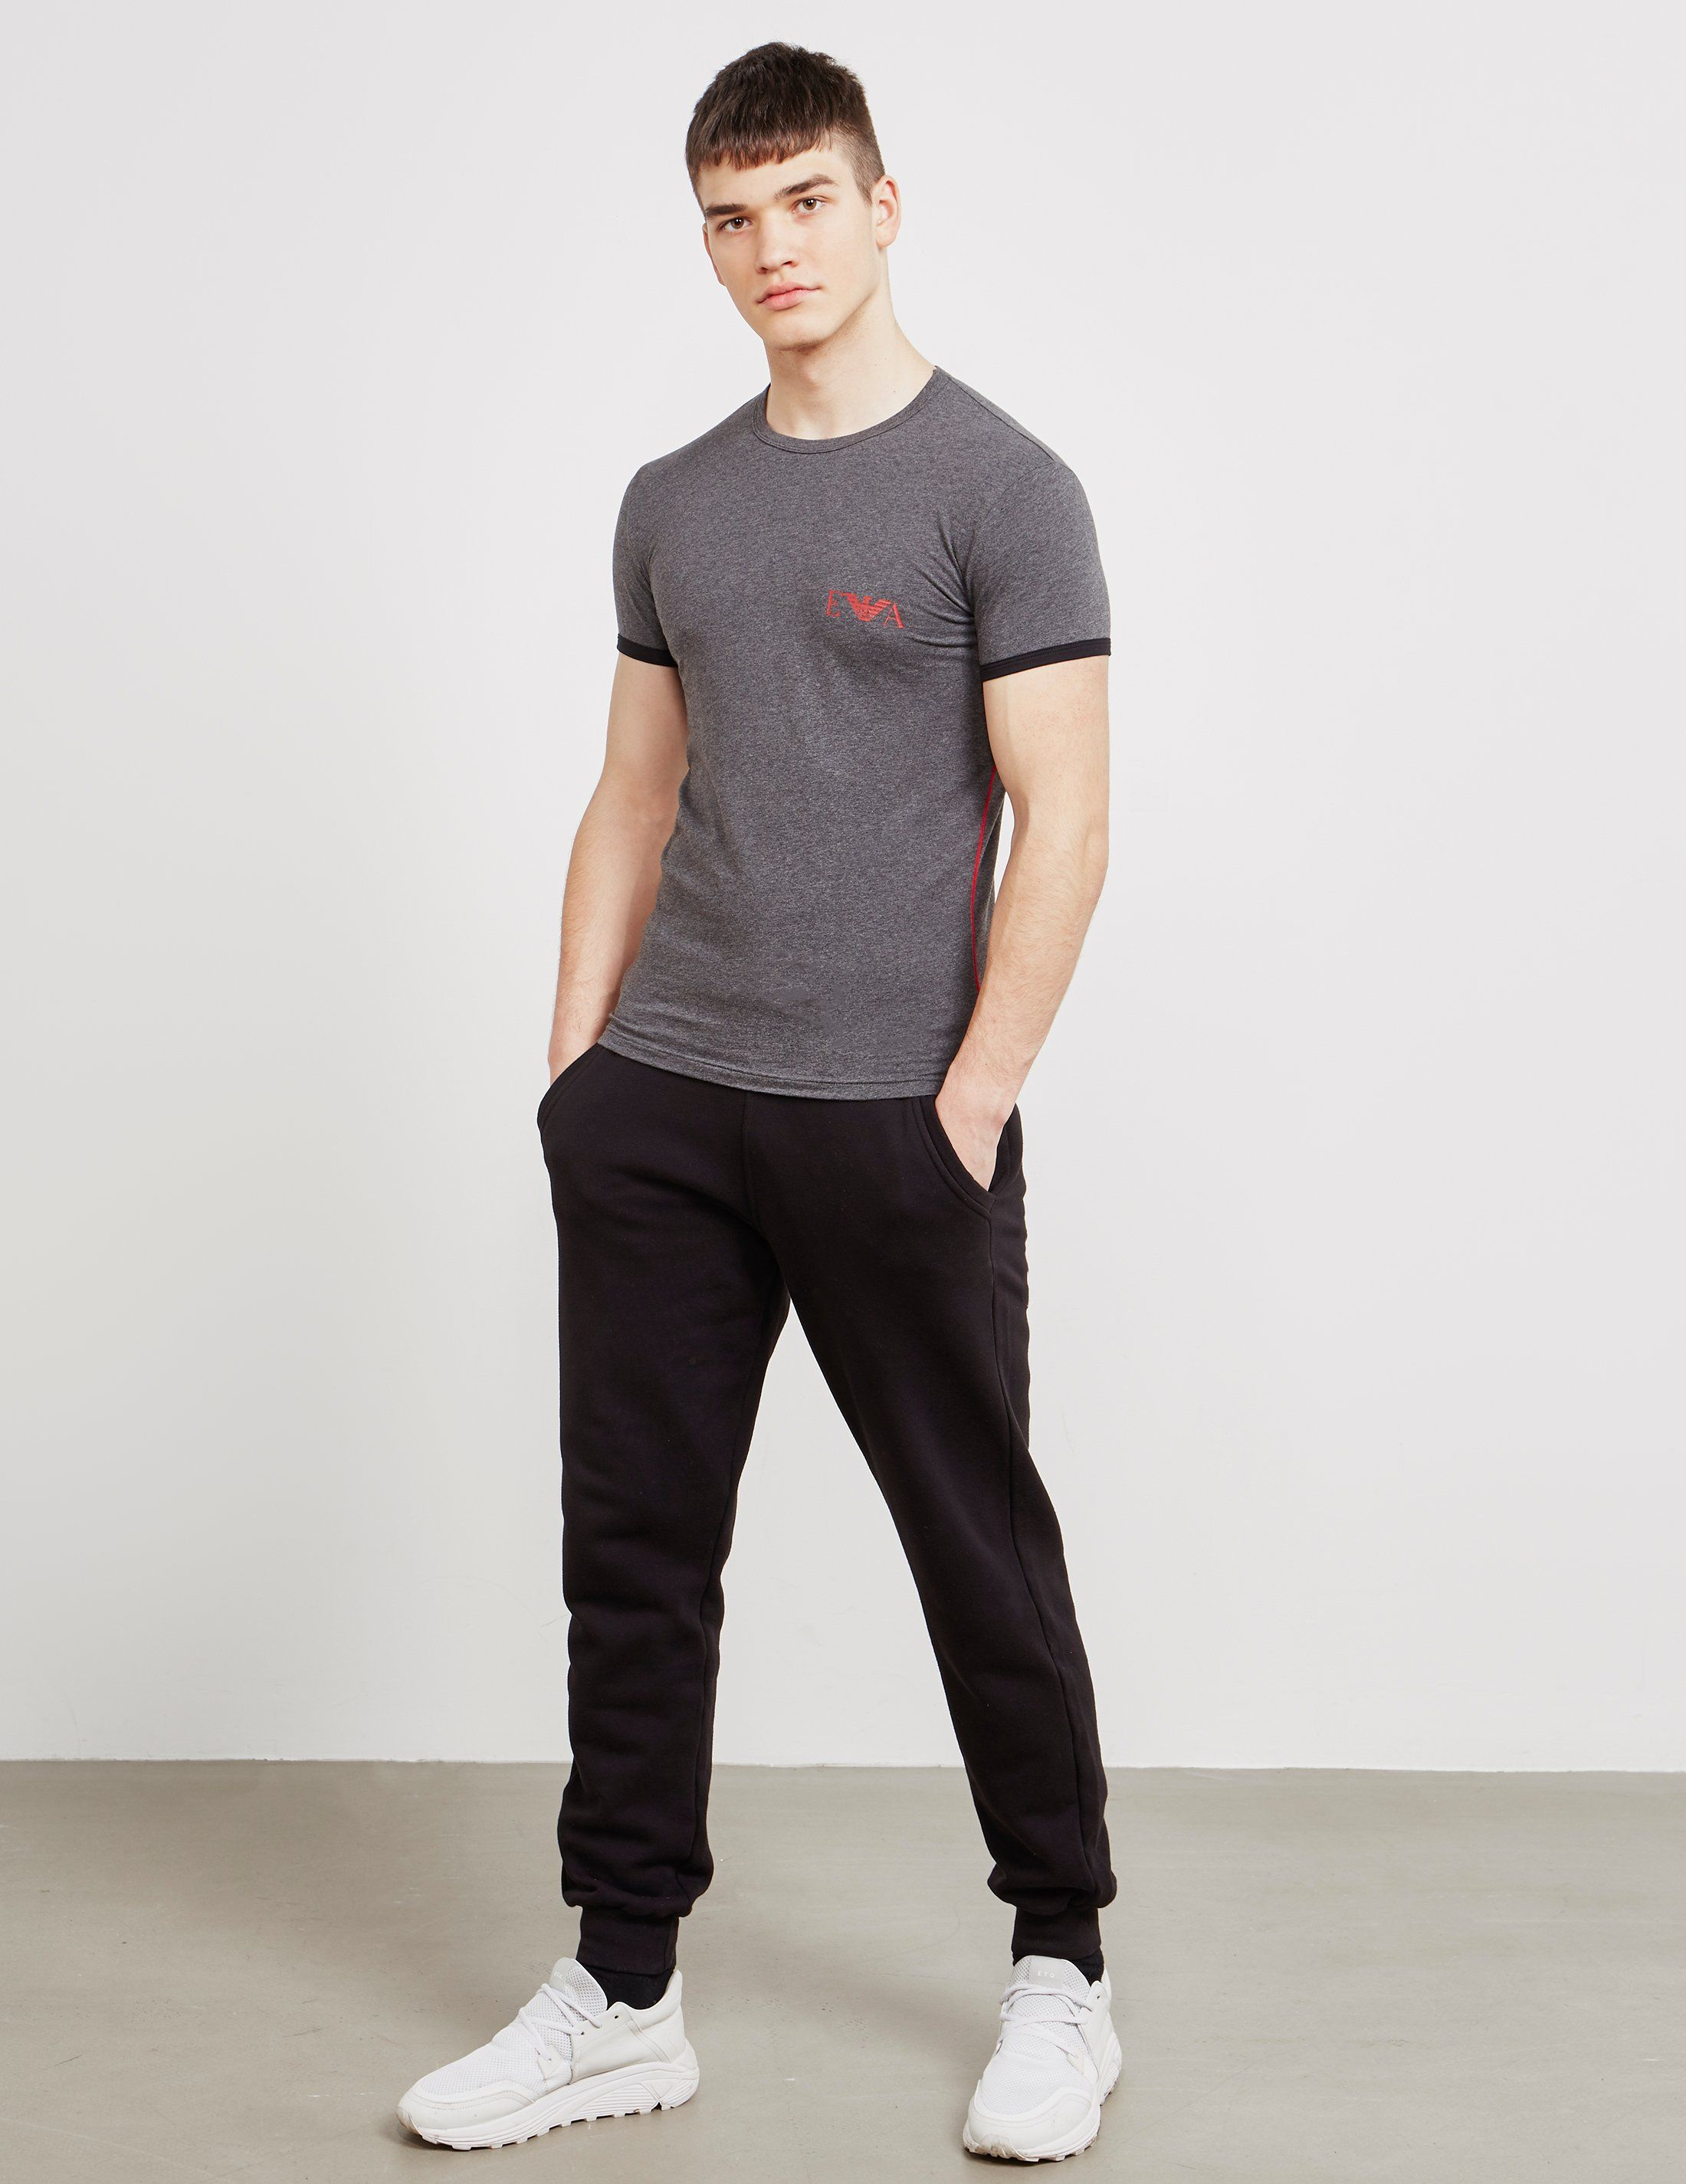 Emporio Armani Tipped Short Sleeve T-Shirt